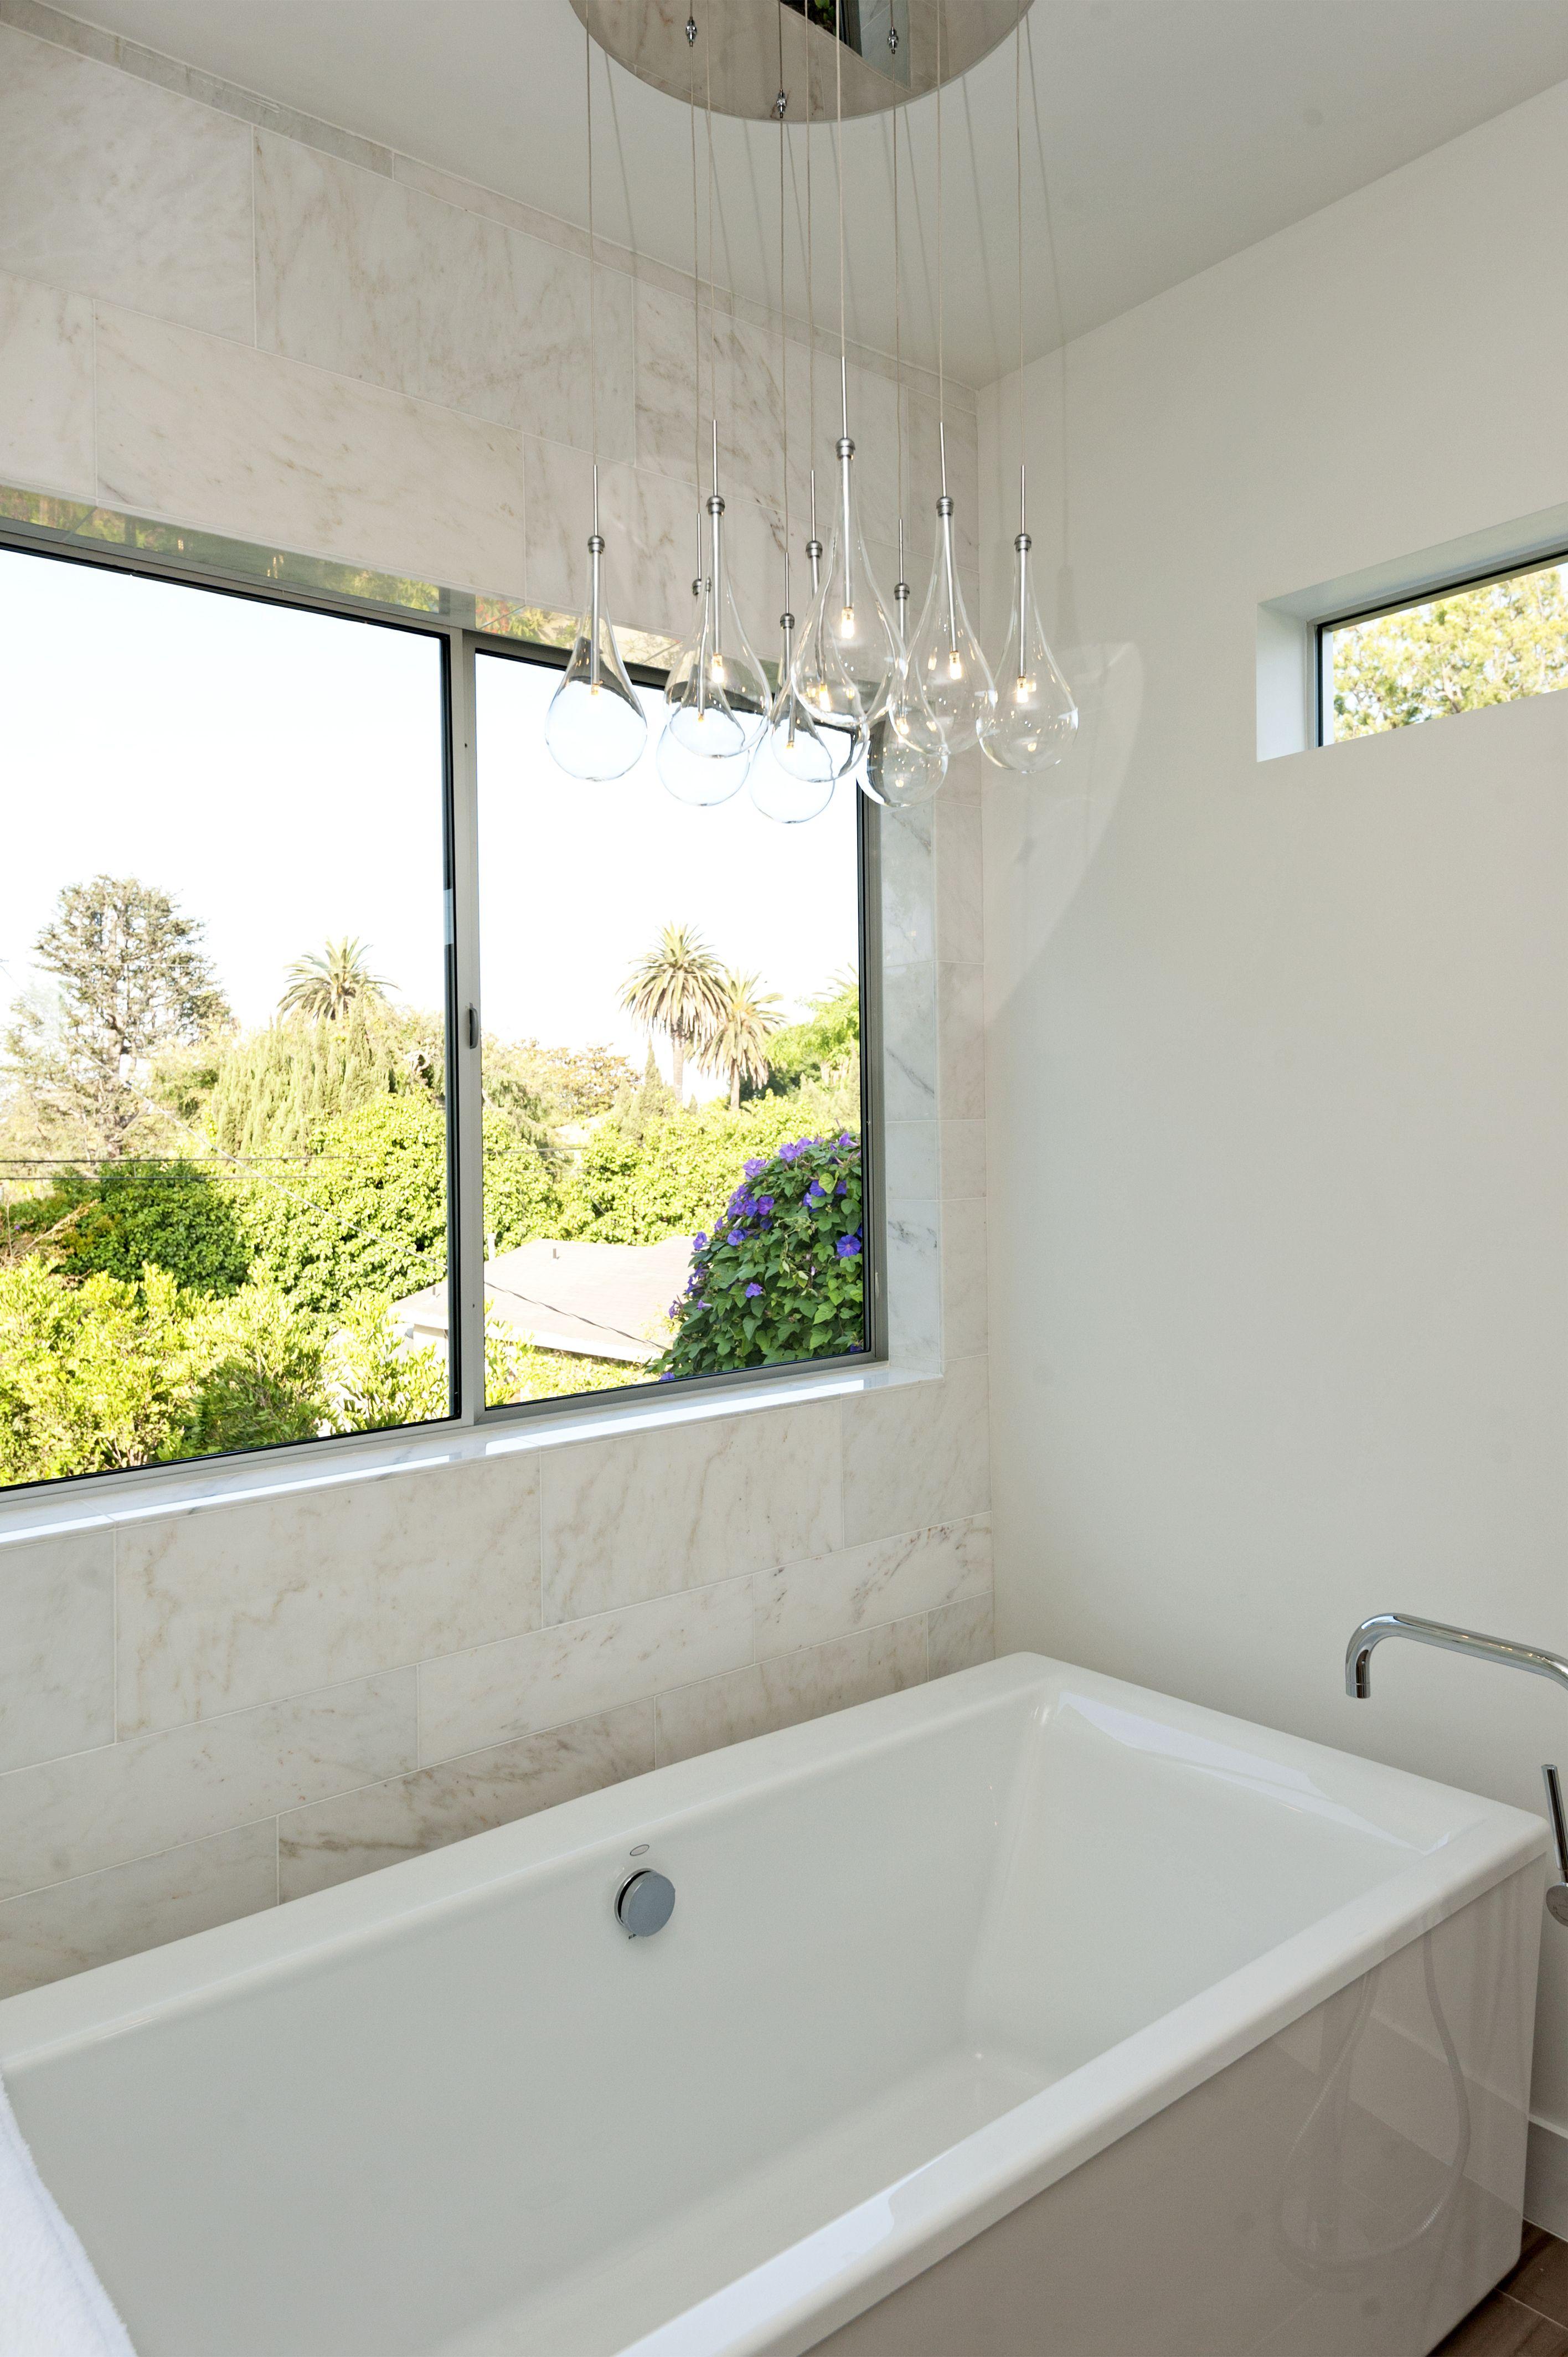 Transitional Style Bathroom With 9 Light Multi Pendant Above Bathtub Wegotlites 574 20 Www Wegotlites Net Bathroom Styling Bathroom Light Fixtures Et2